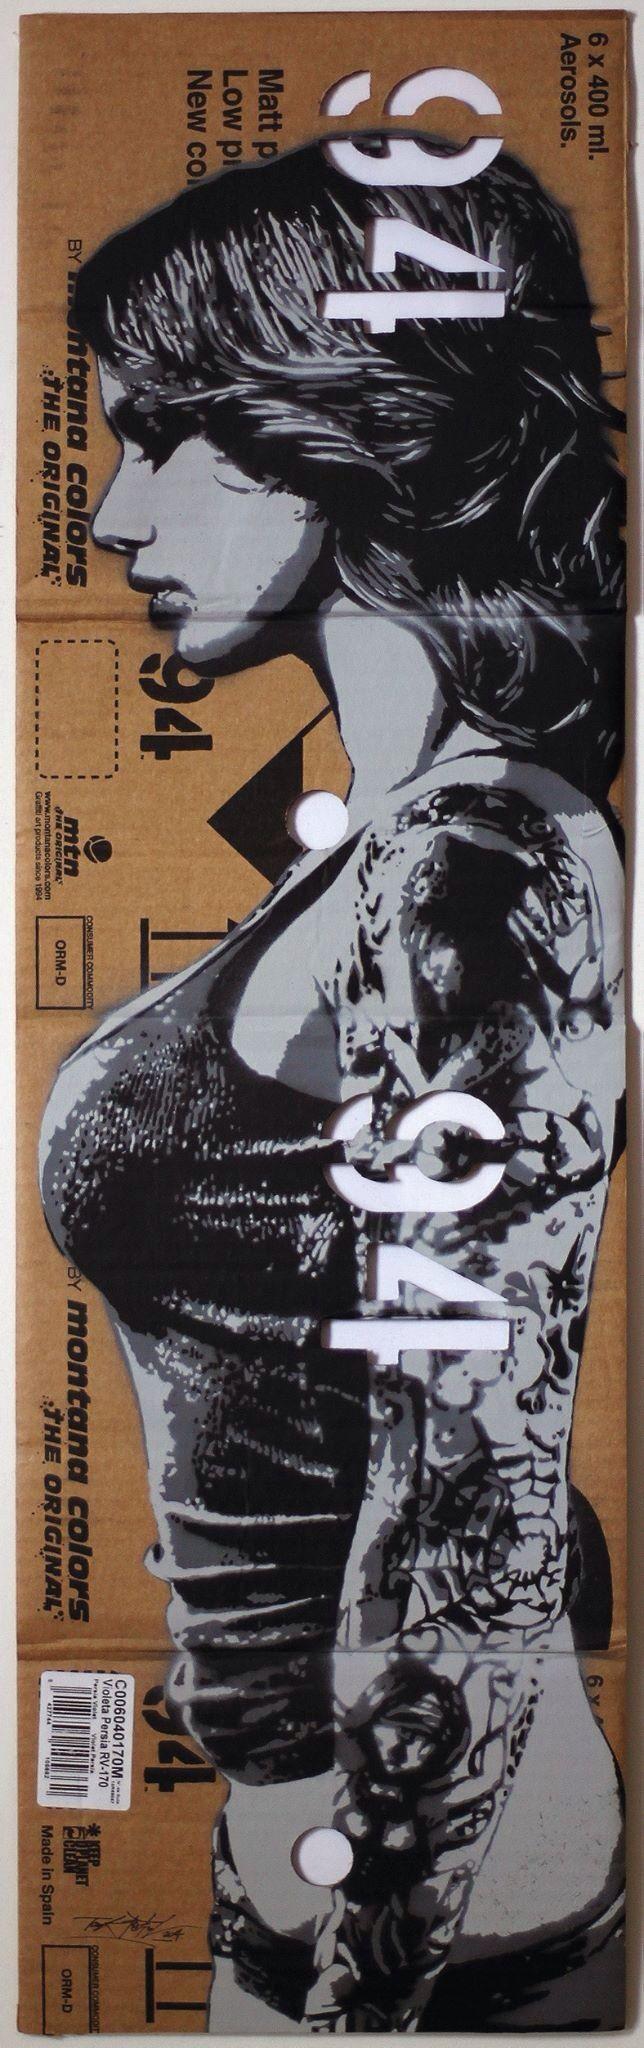 Stencil on cardboard box by Tankpetrol - May 2014...